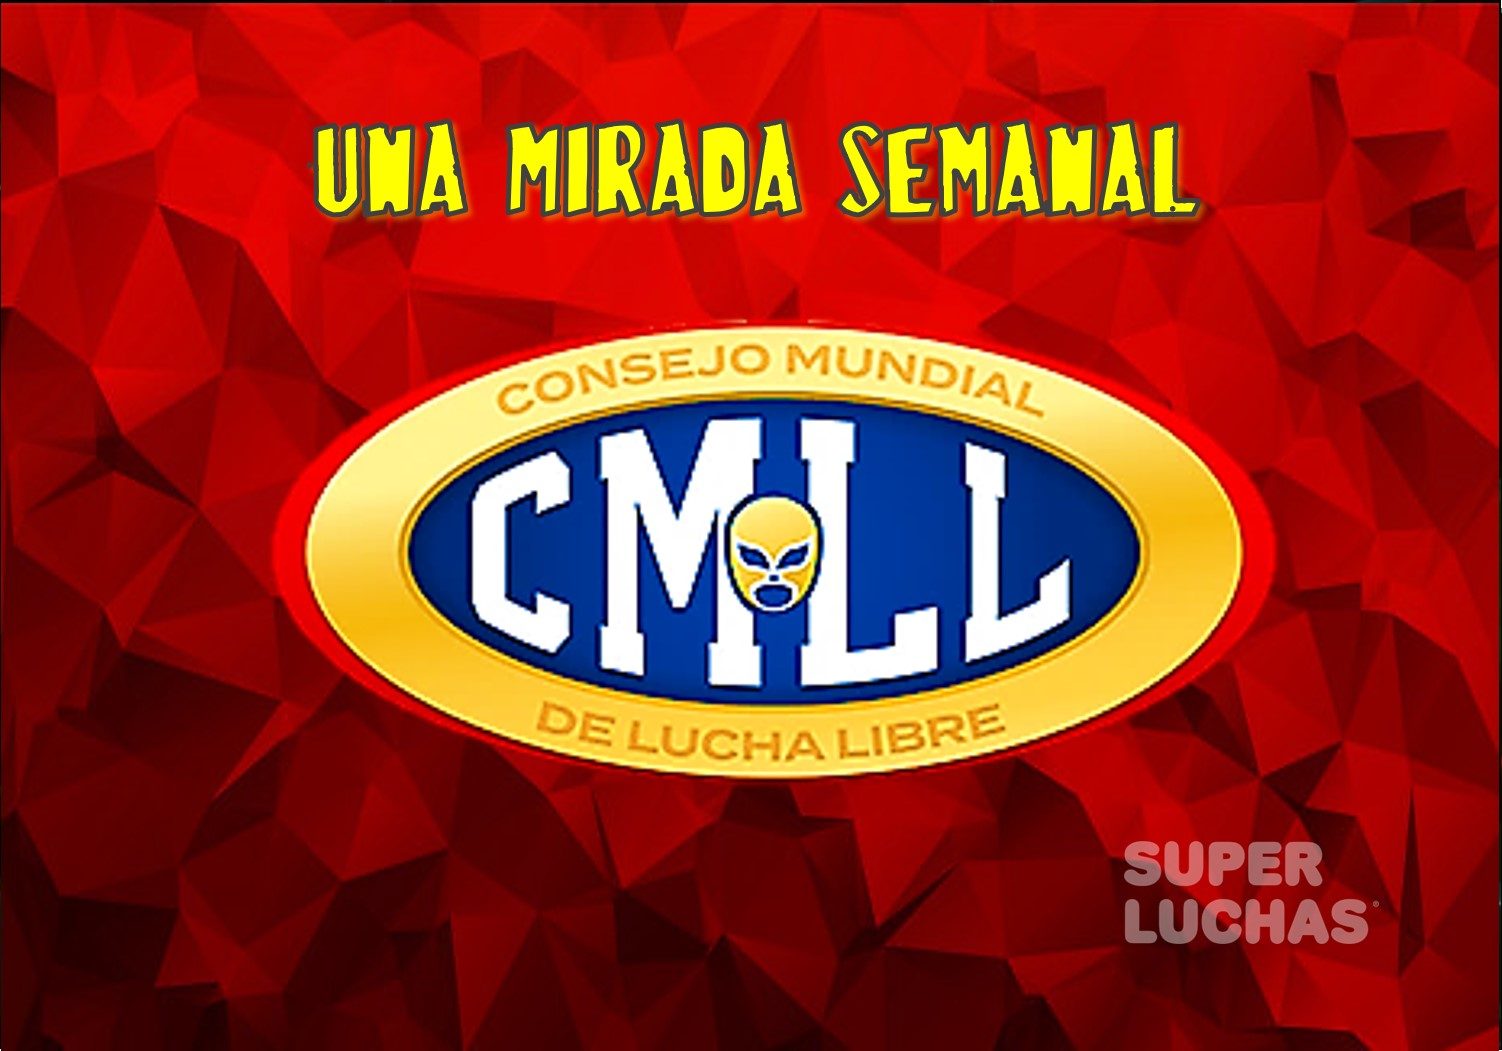 Una mirada semanal al CMLL (del 5 al 11 septiembre de 2019) 6